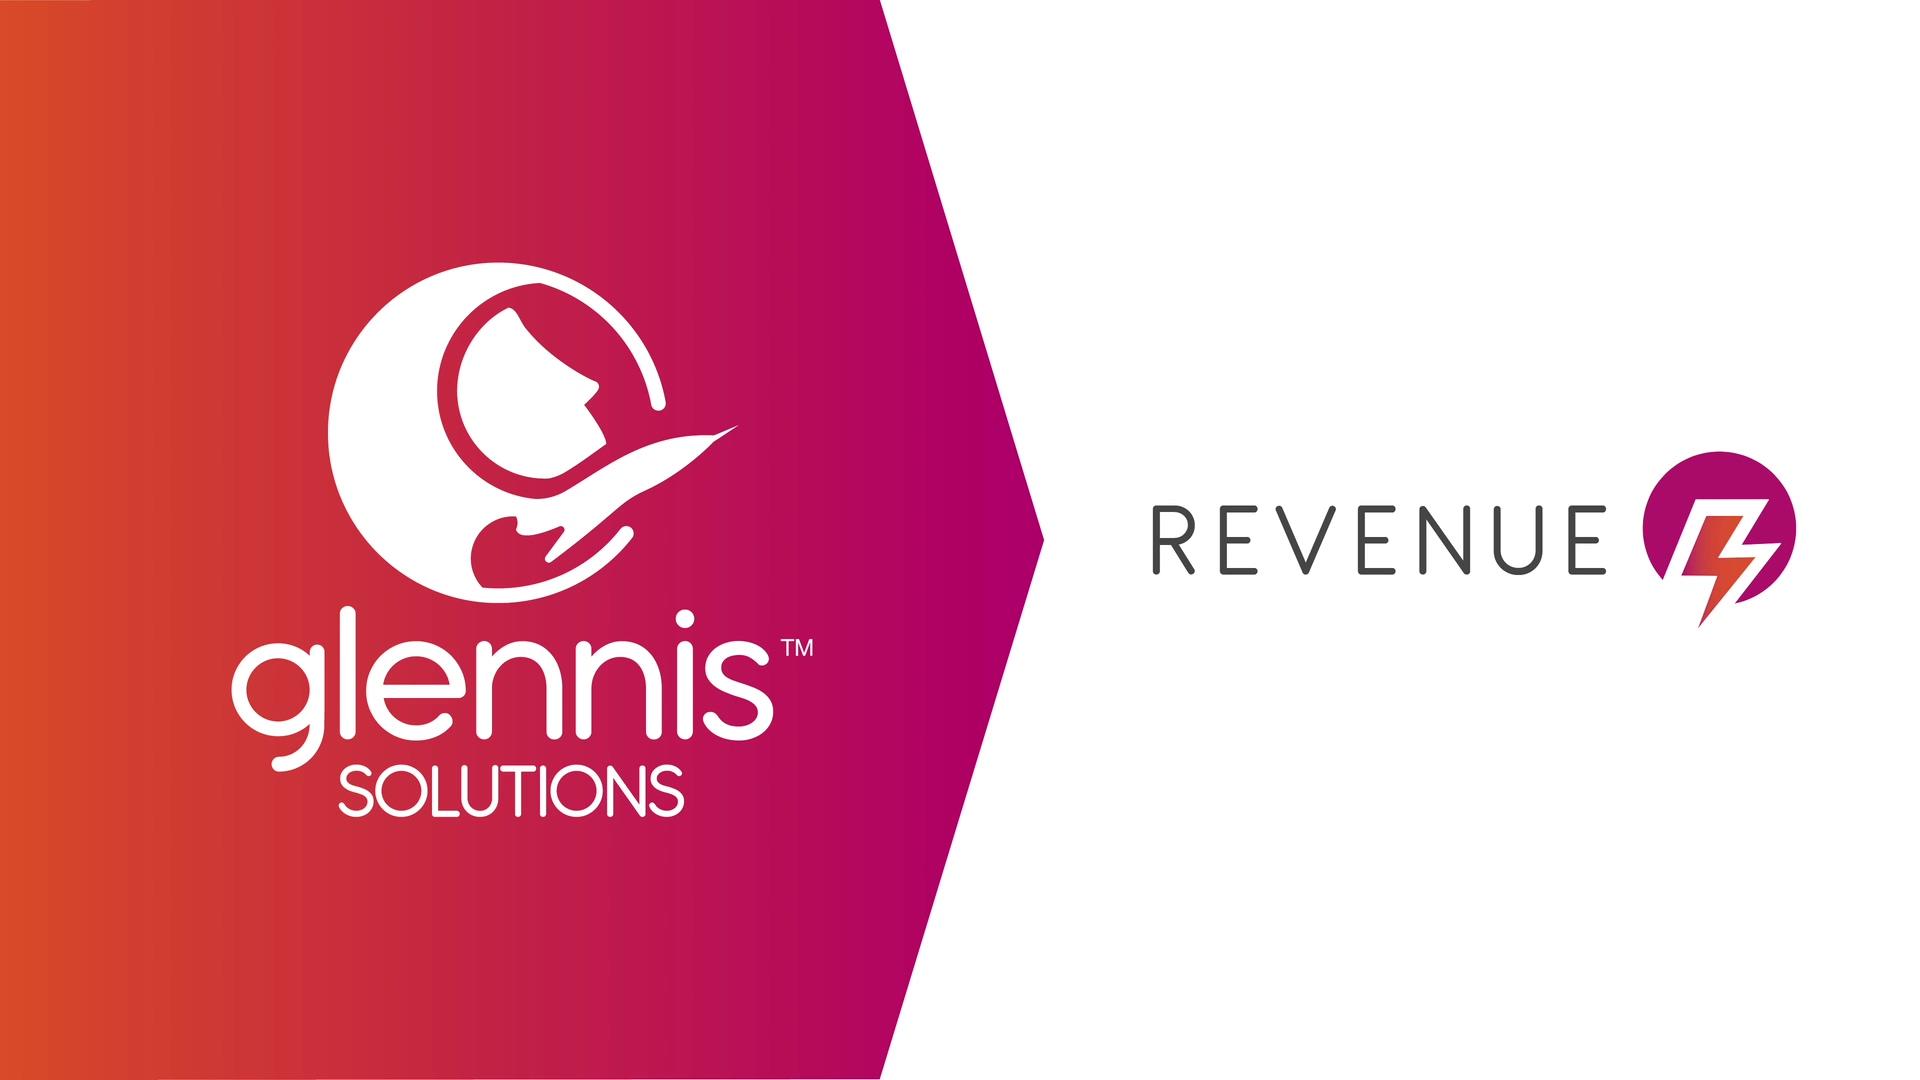 Glennis REVENUE (4) (3)